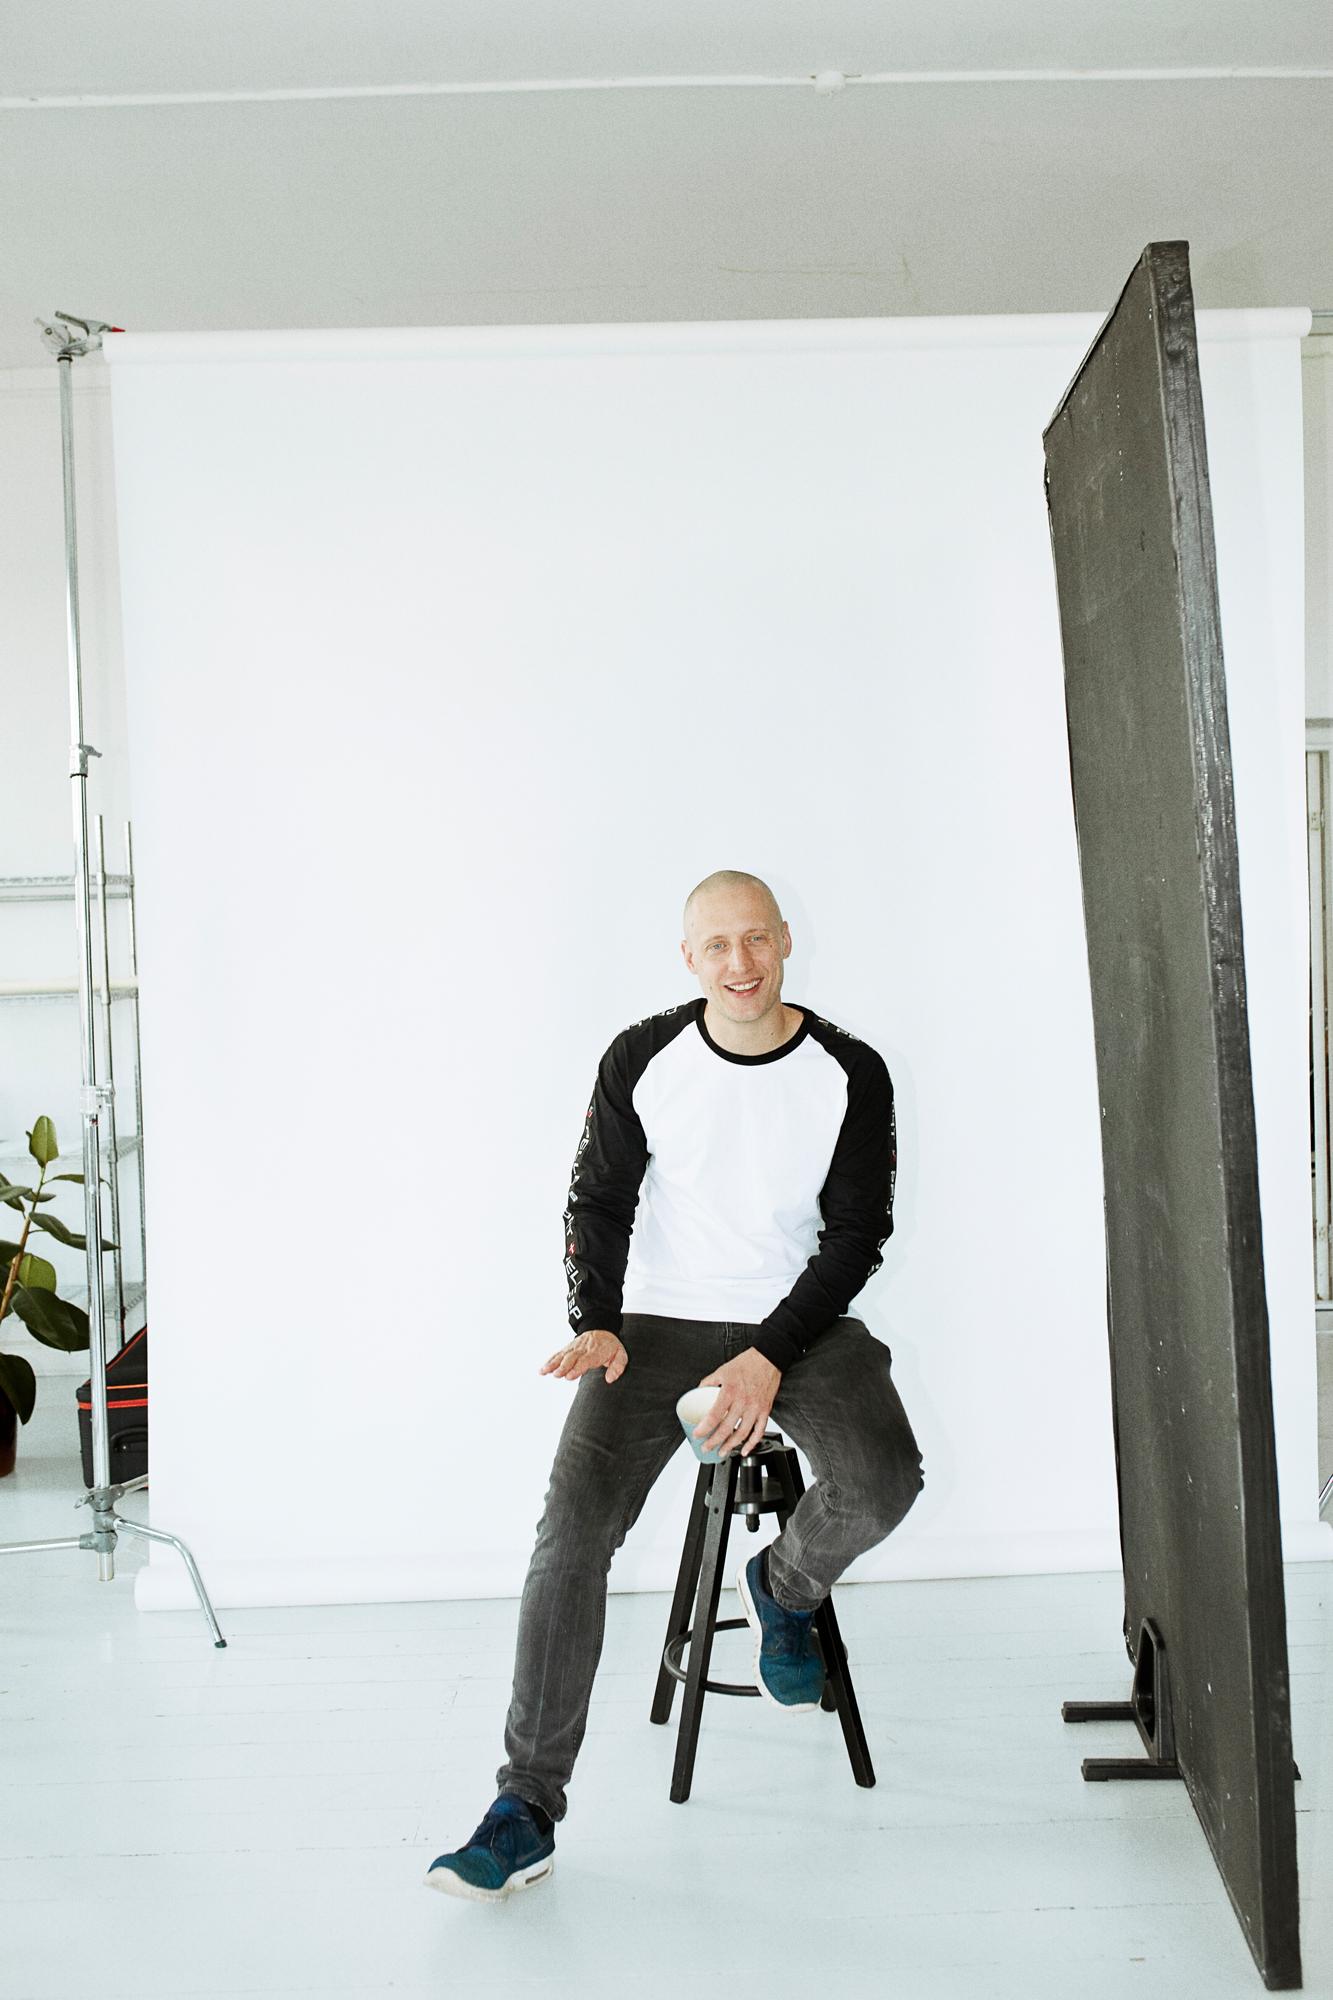 PEDE B by photographer Kia Hartelius